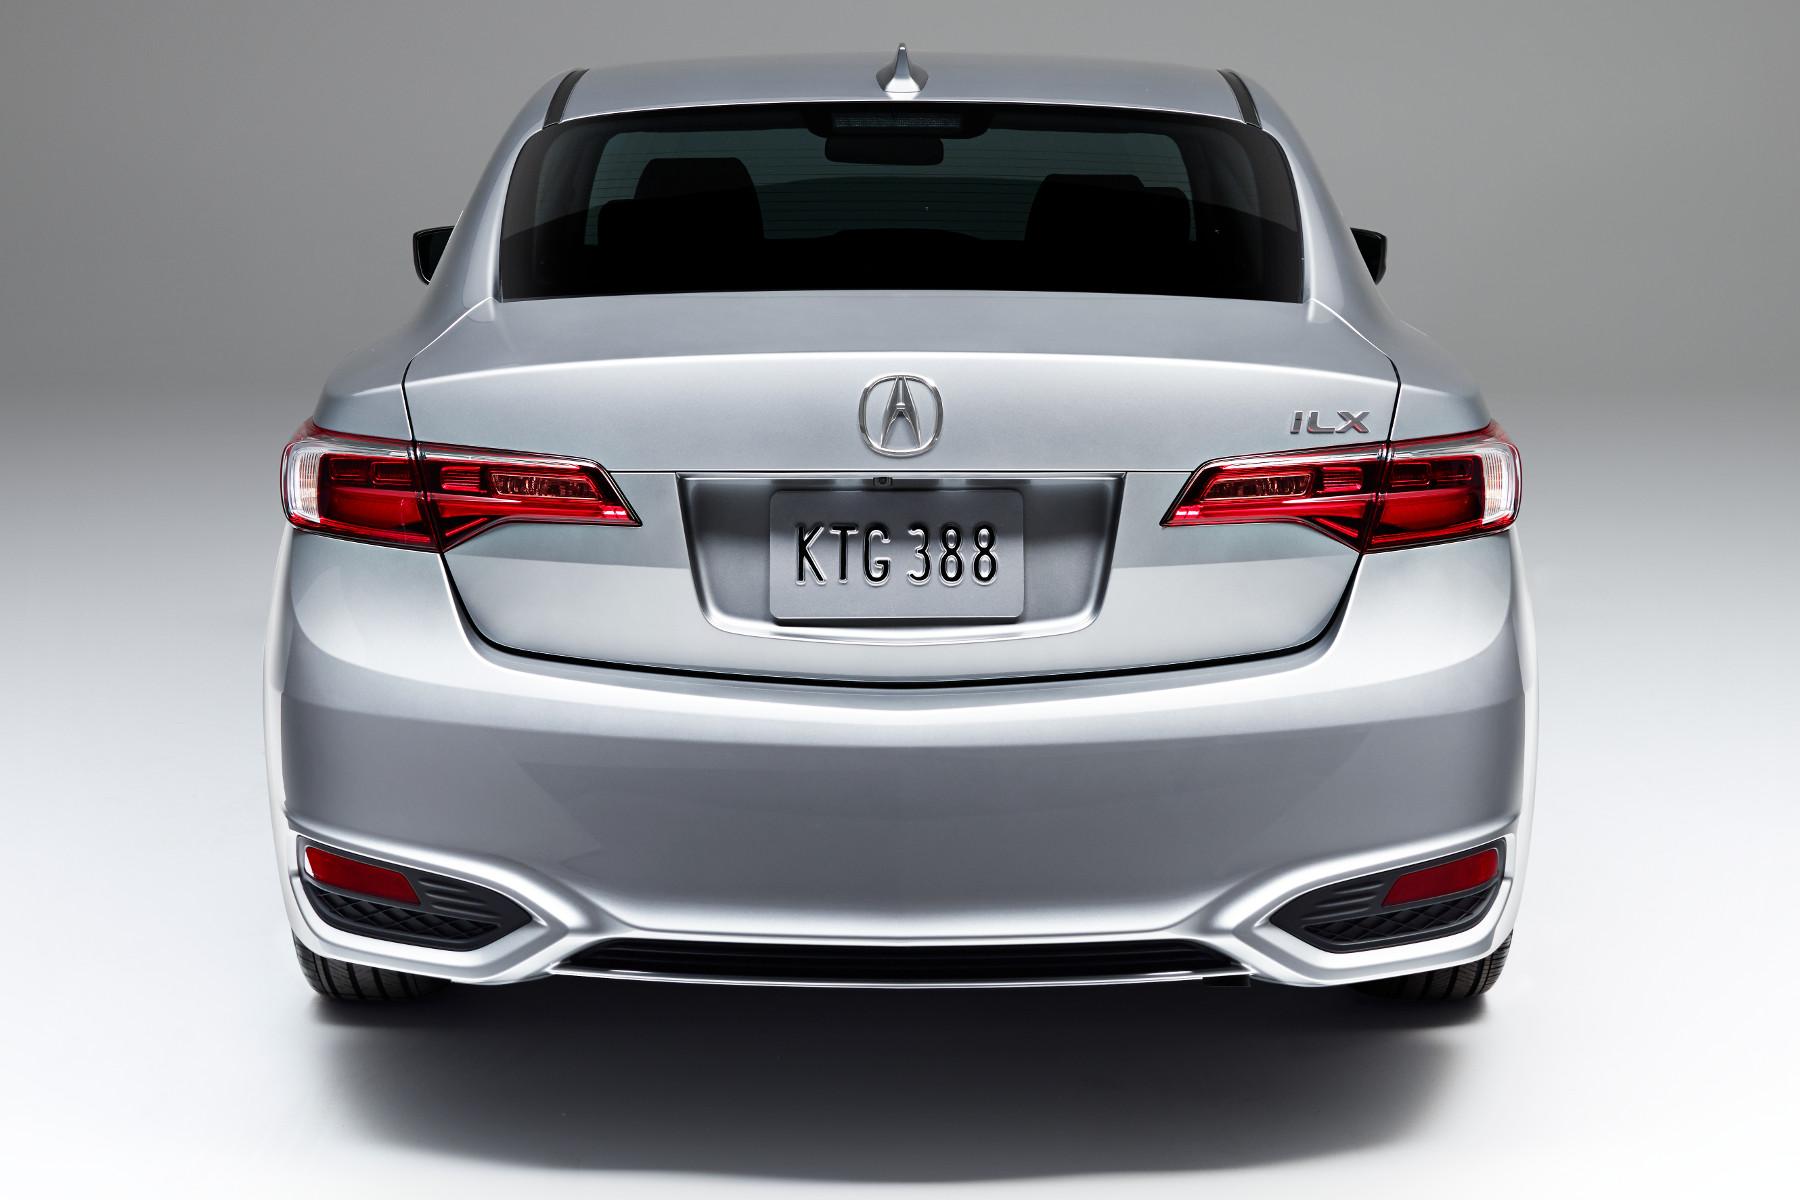 2016 ILX rear exterior